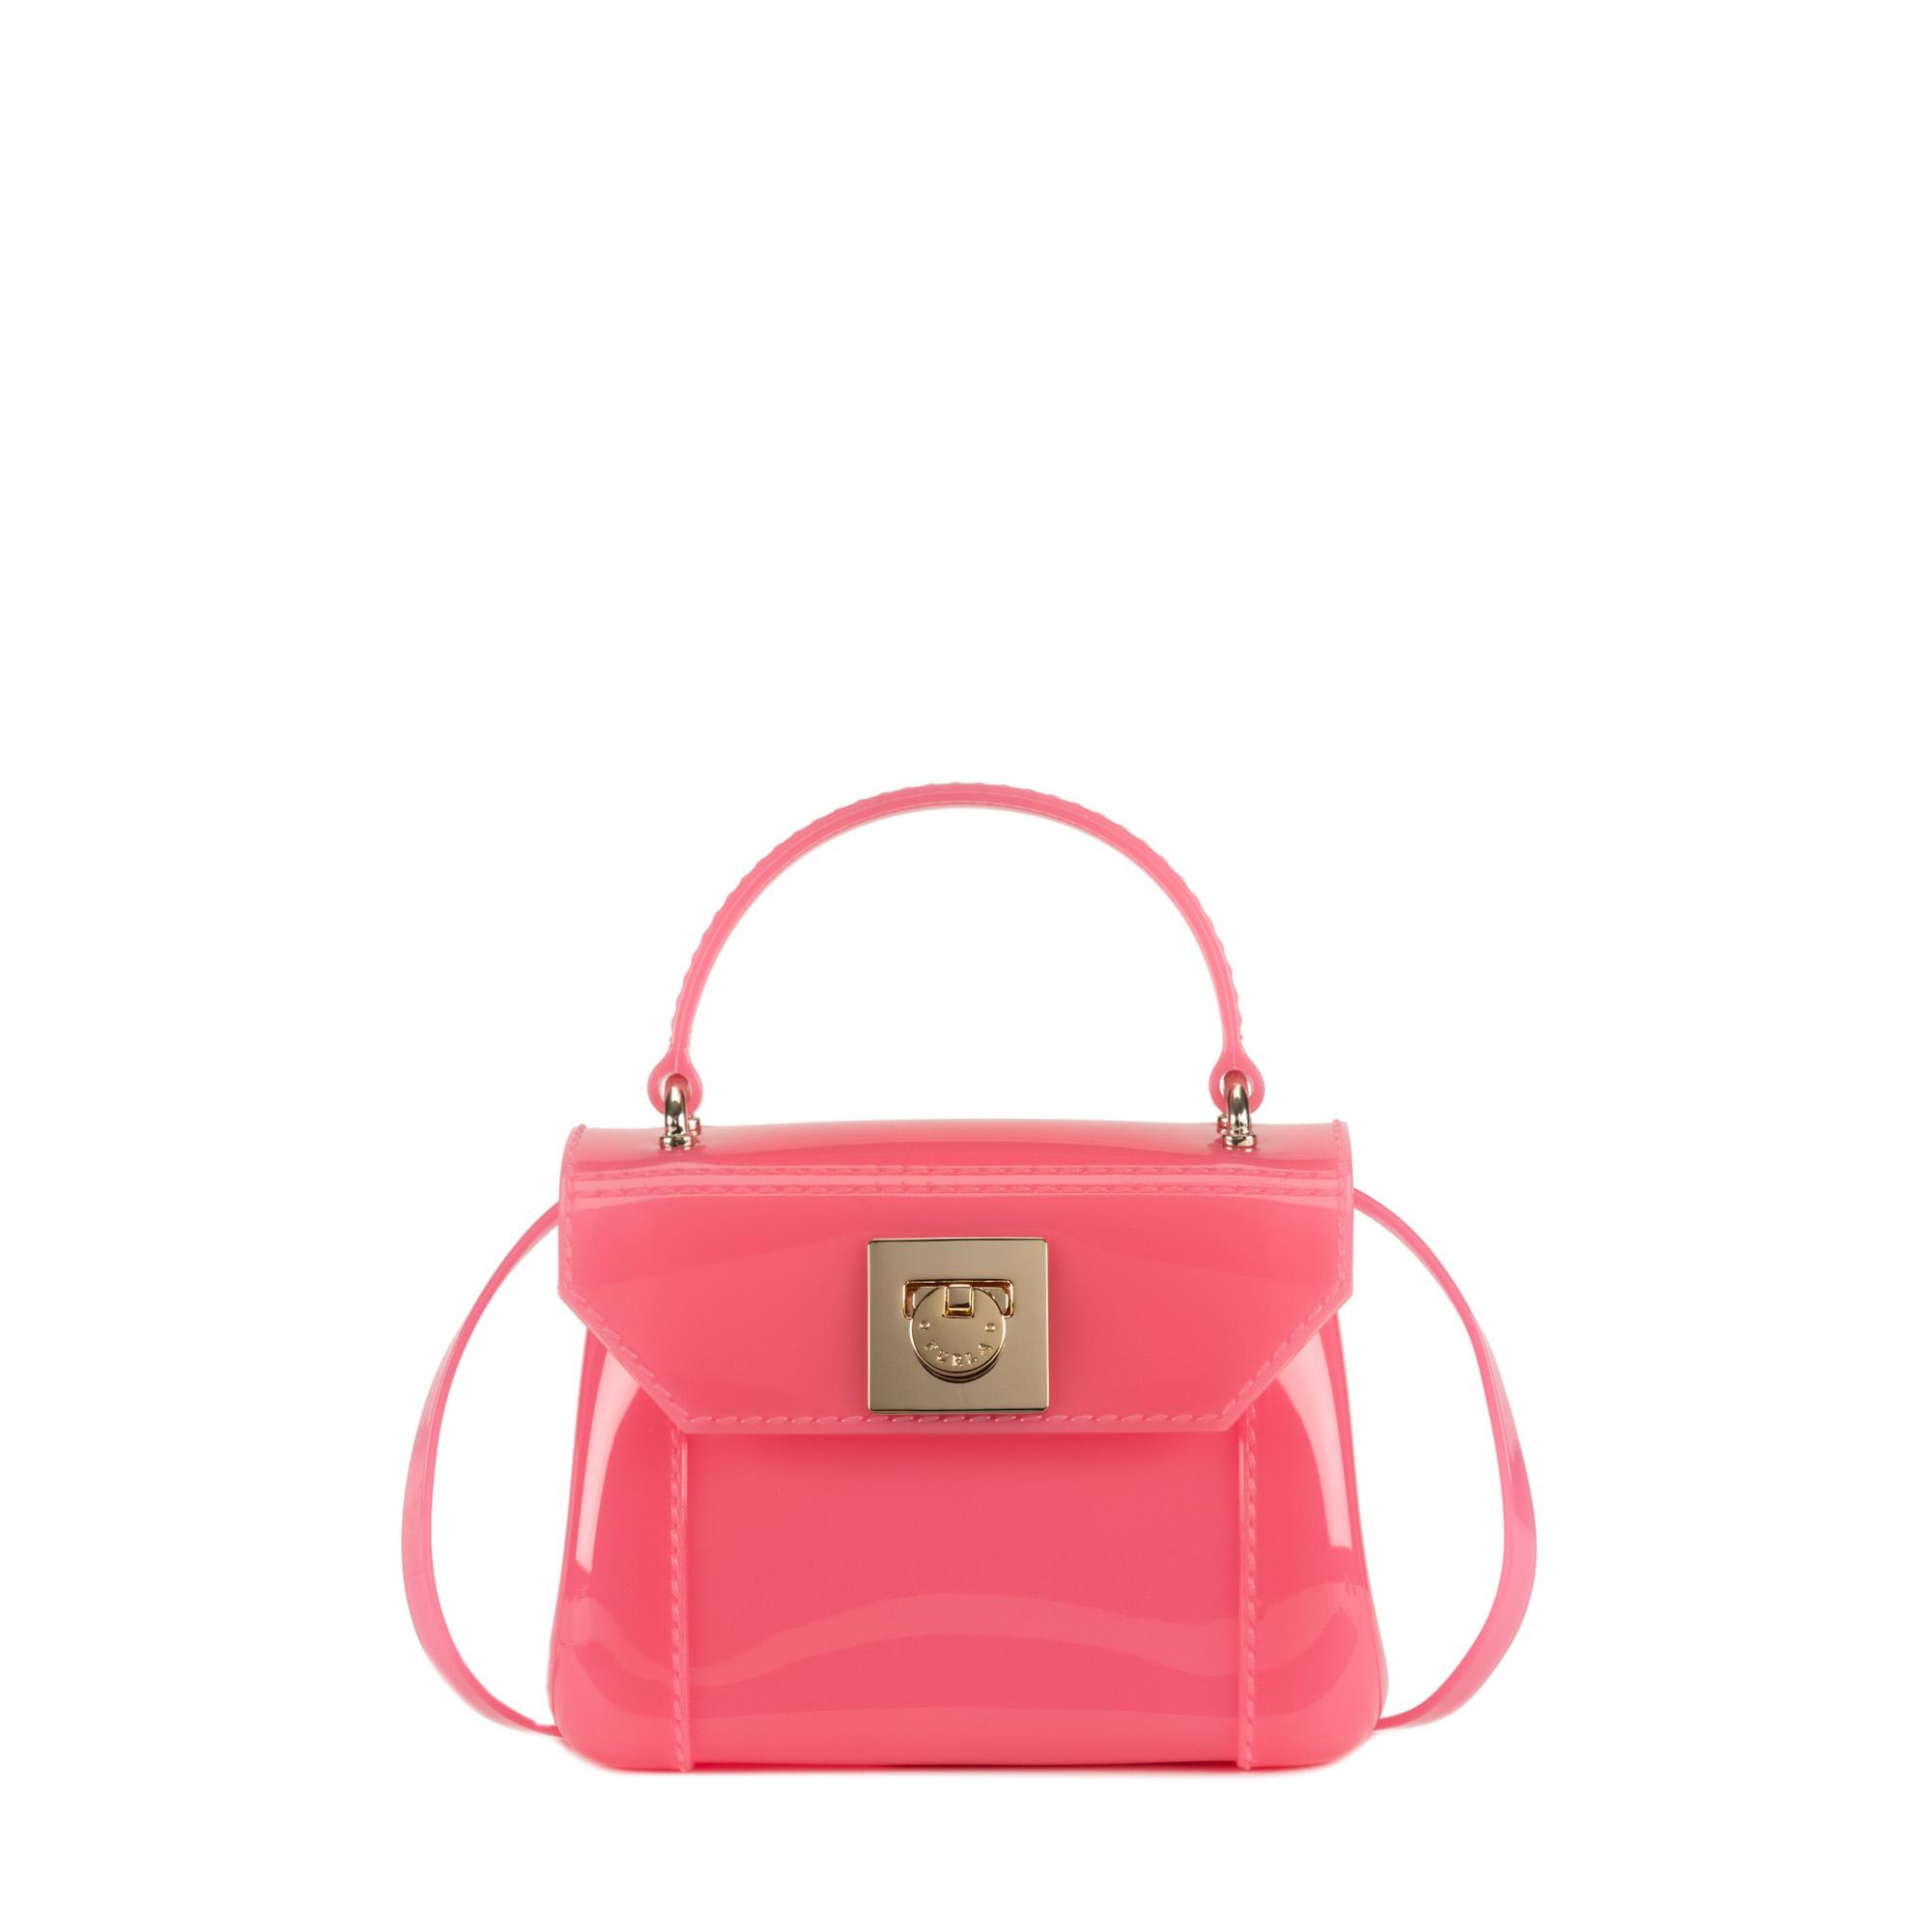 furla mini bag in pink lyst